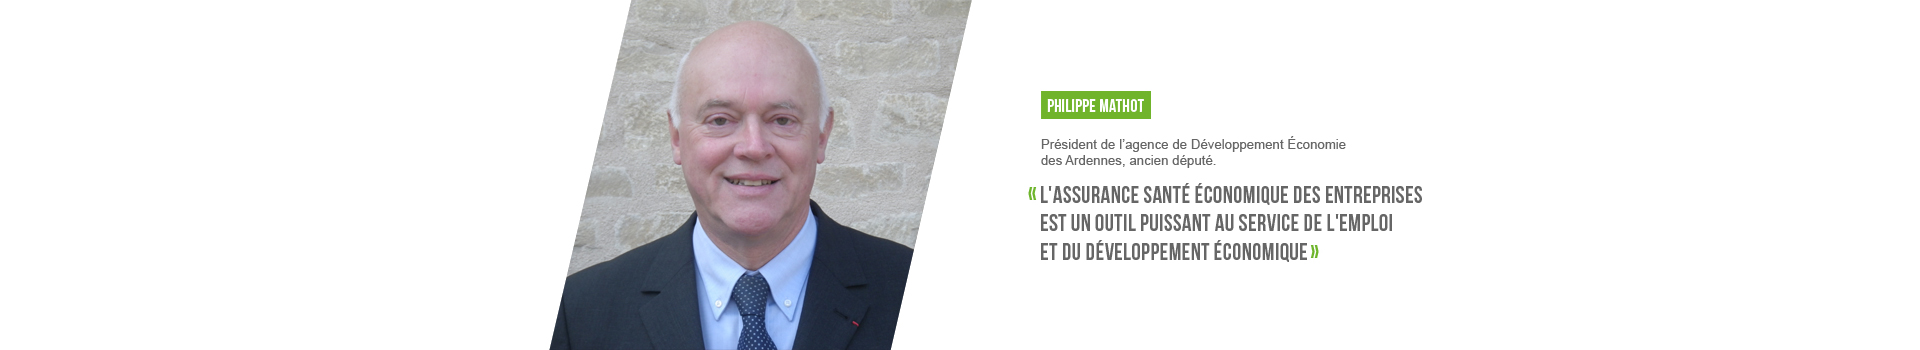 philippe-mathot